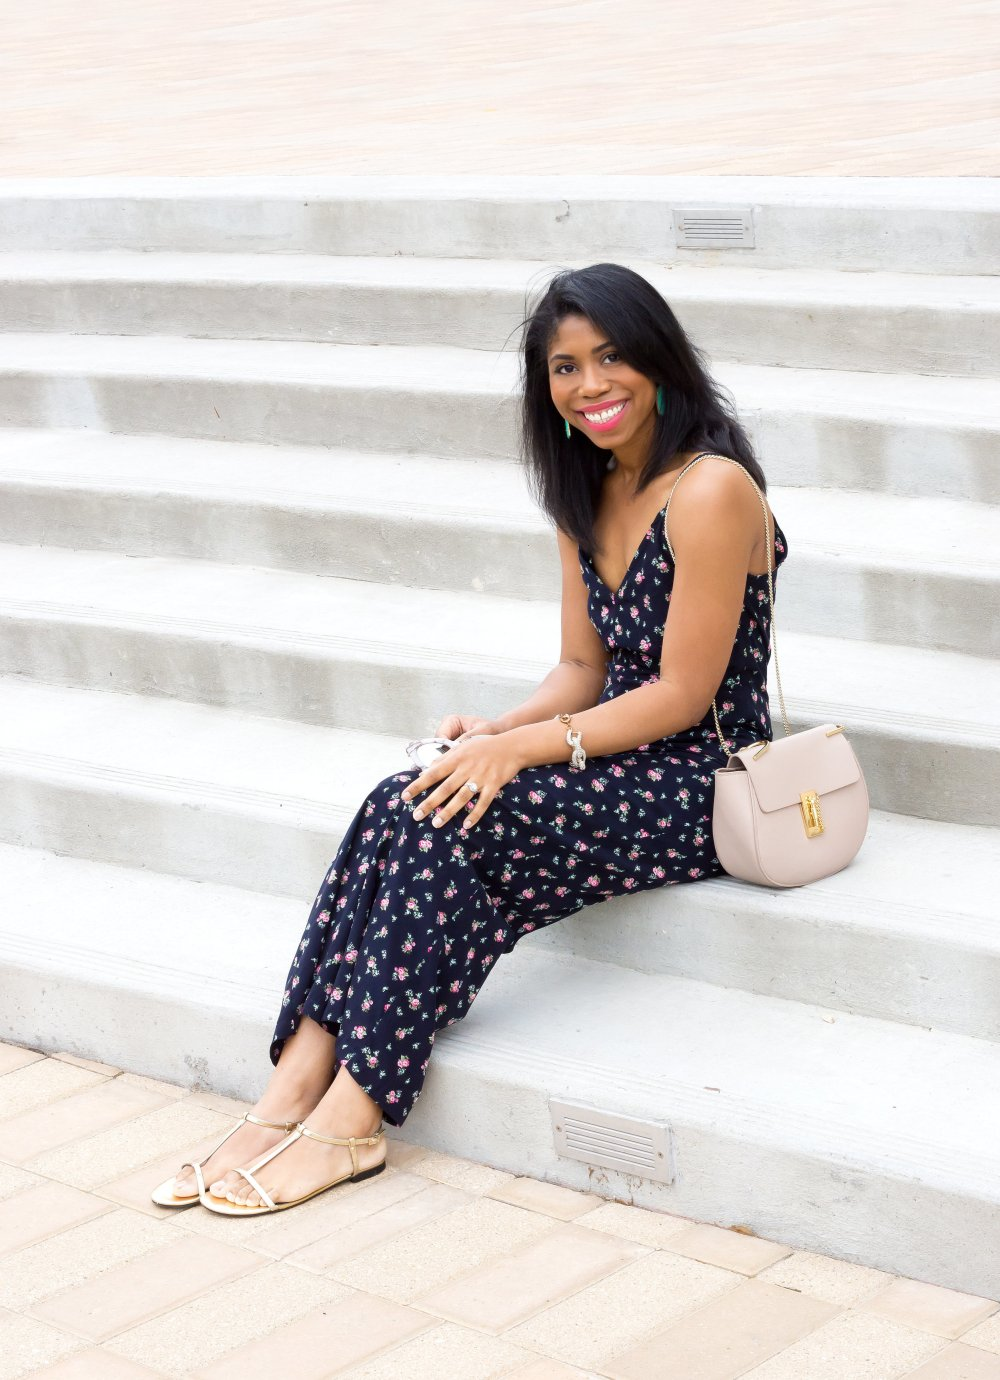 spring summer style floral jumpsuit under $100 chloe handbag stephanie taylor jackson best black fashion bloggers